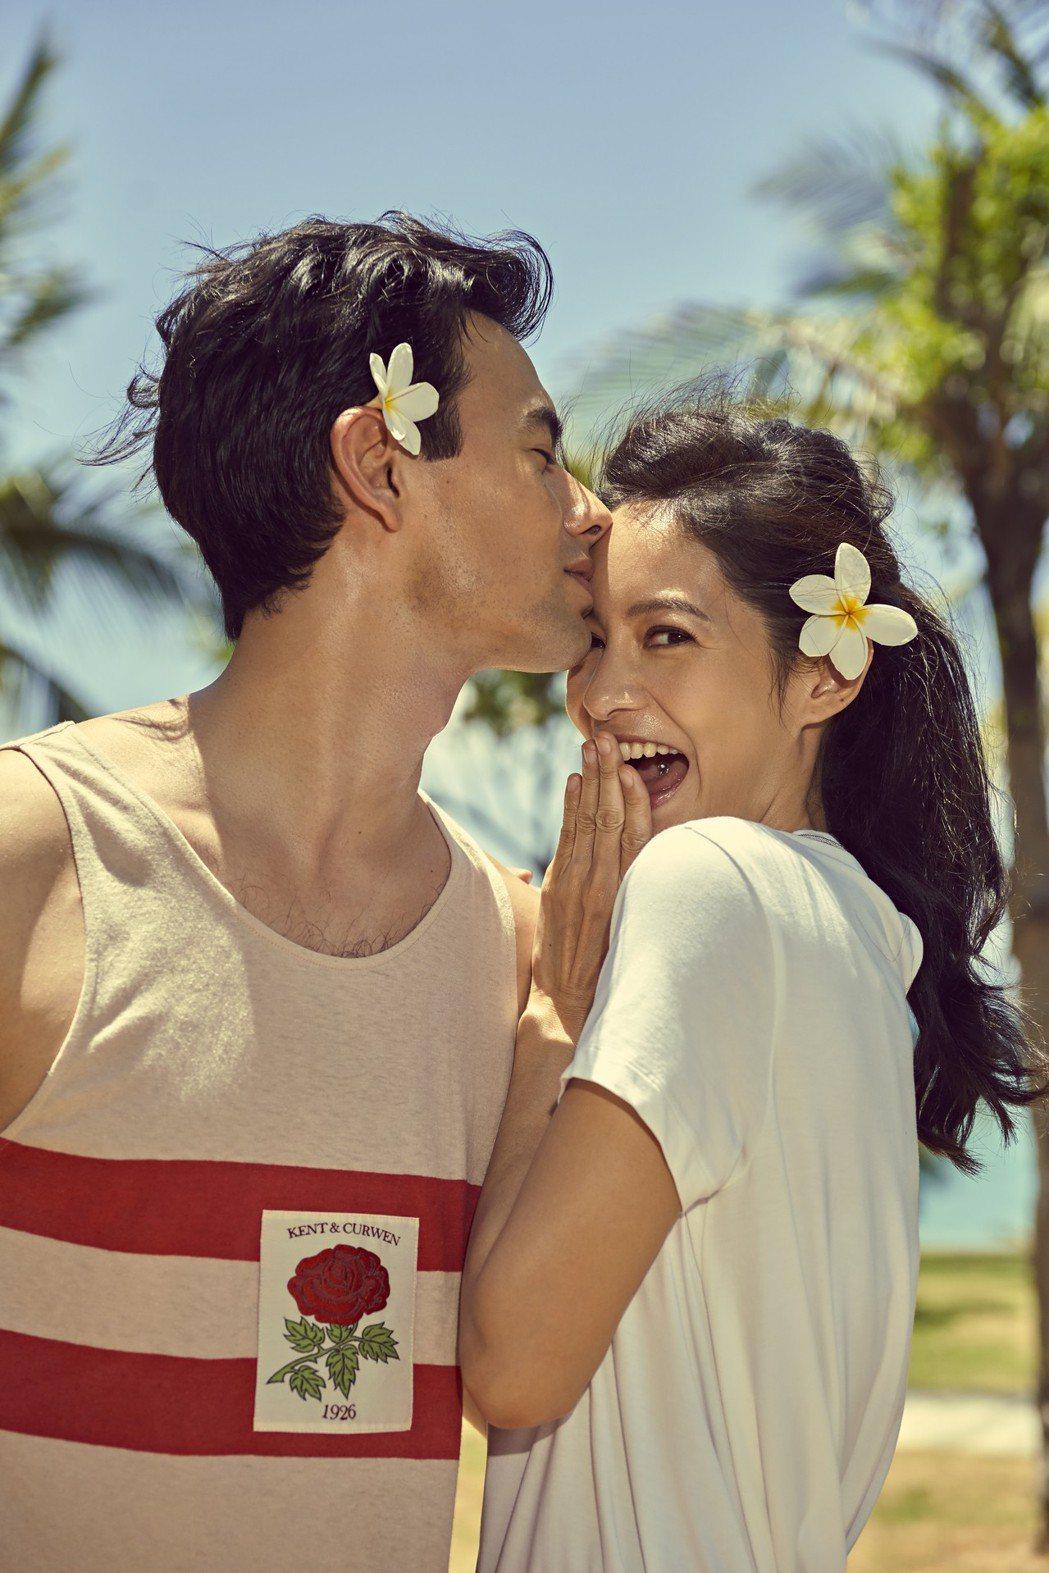 Janet與老公George同遊三亞拍攝雜誌封面。圖/Ciao潮旅提供